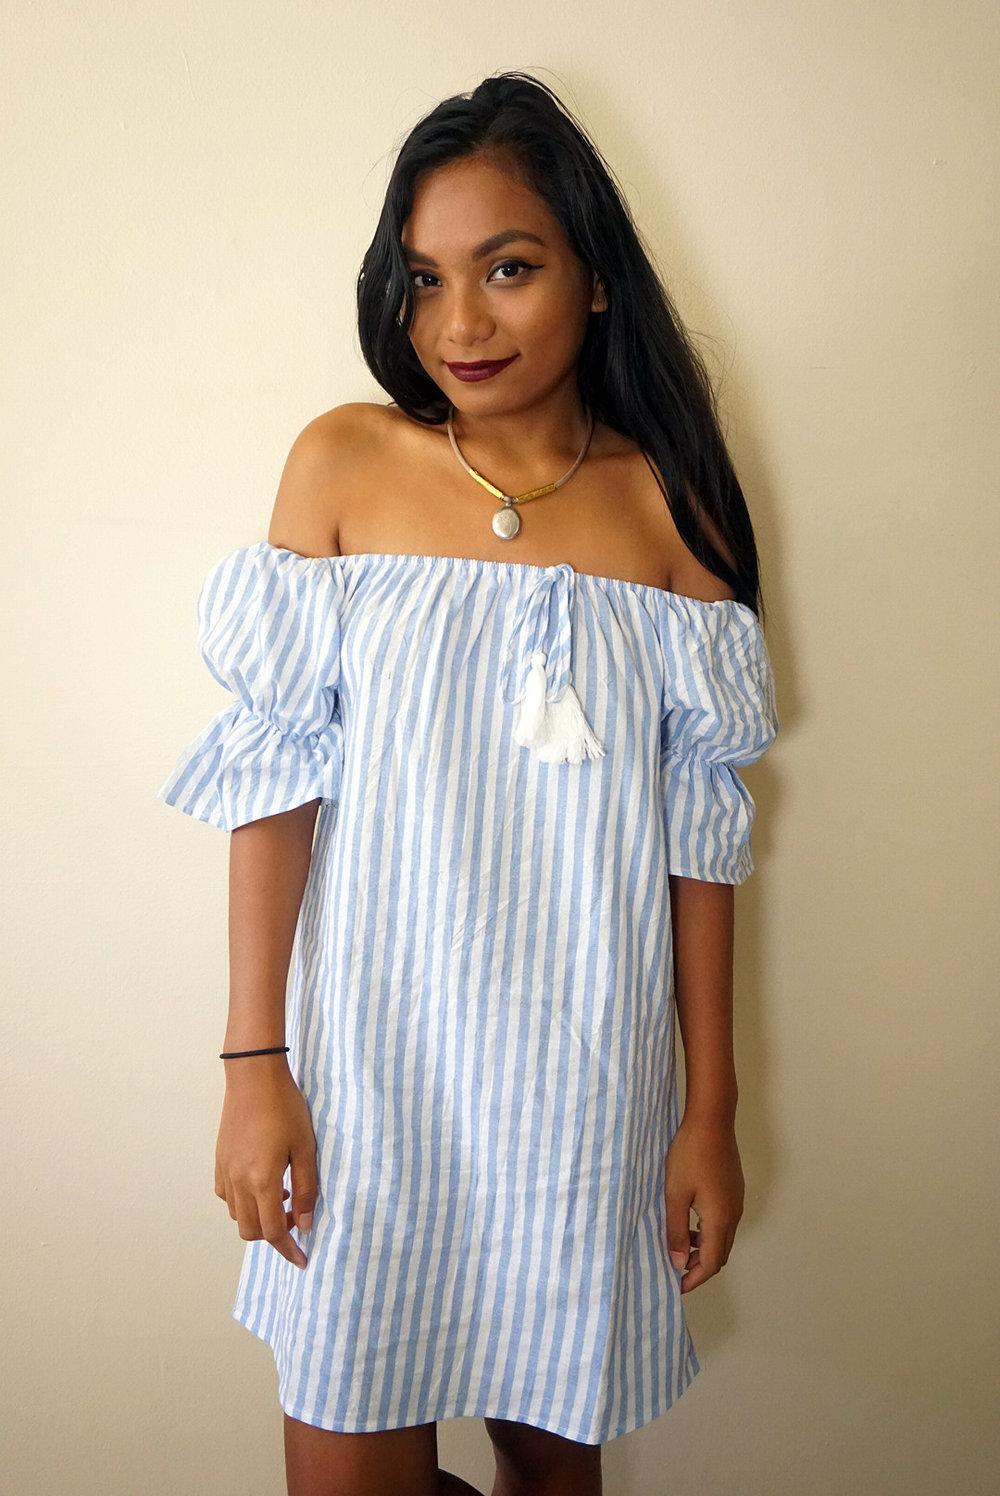 Off-the-shoulder-striped-dress-summer-fall-style-blogger-LINDATENCHITRAN-6-1616x1080.jpg